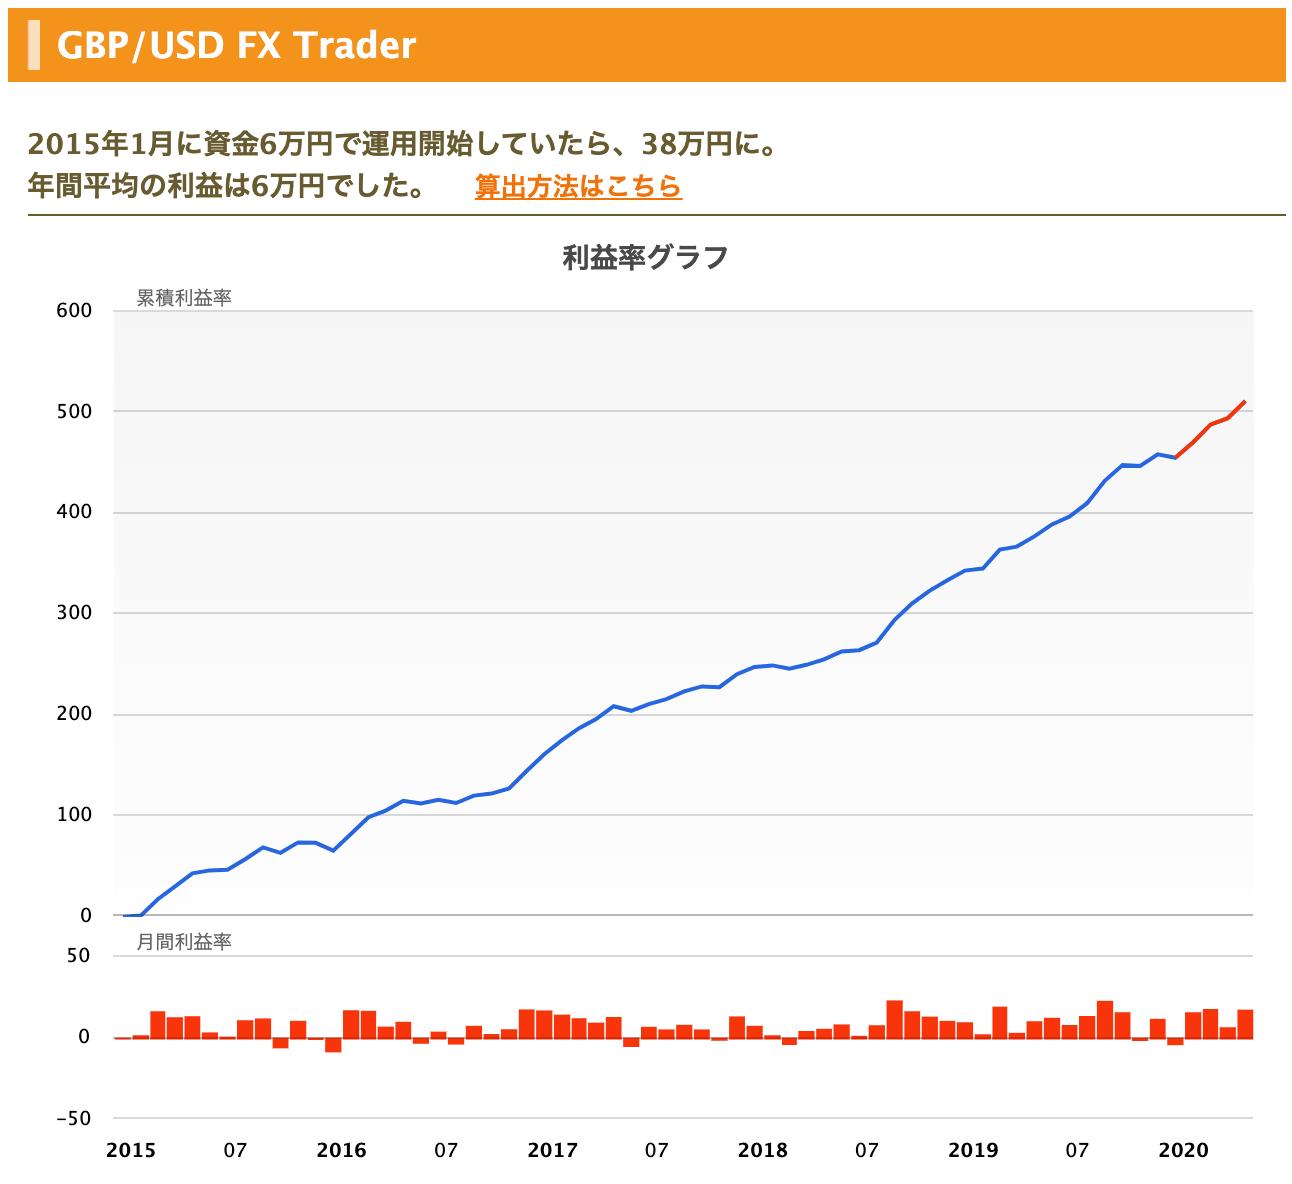 GBPUSD FX Trader terrace chart - FX自動売買 高勝率の最強ロジック搭載EA!